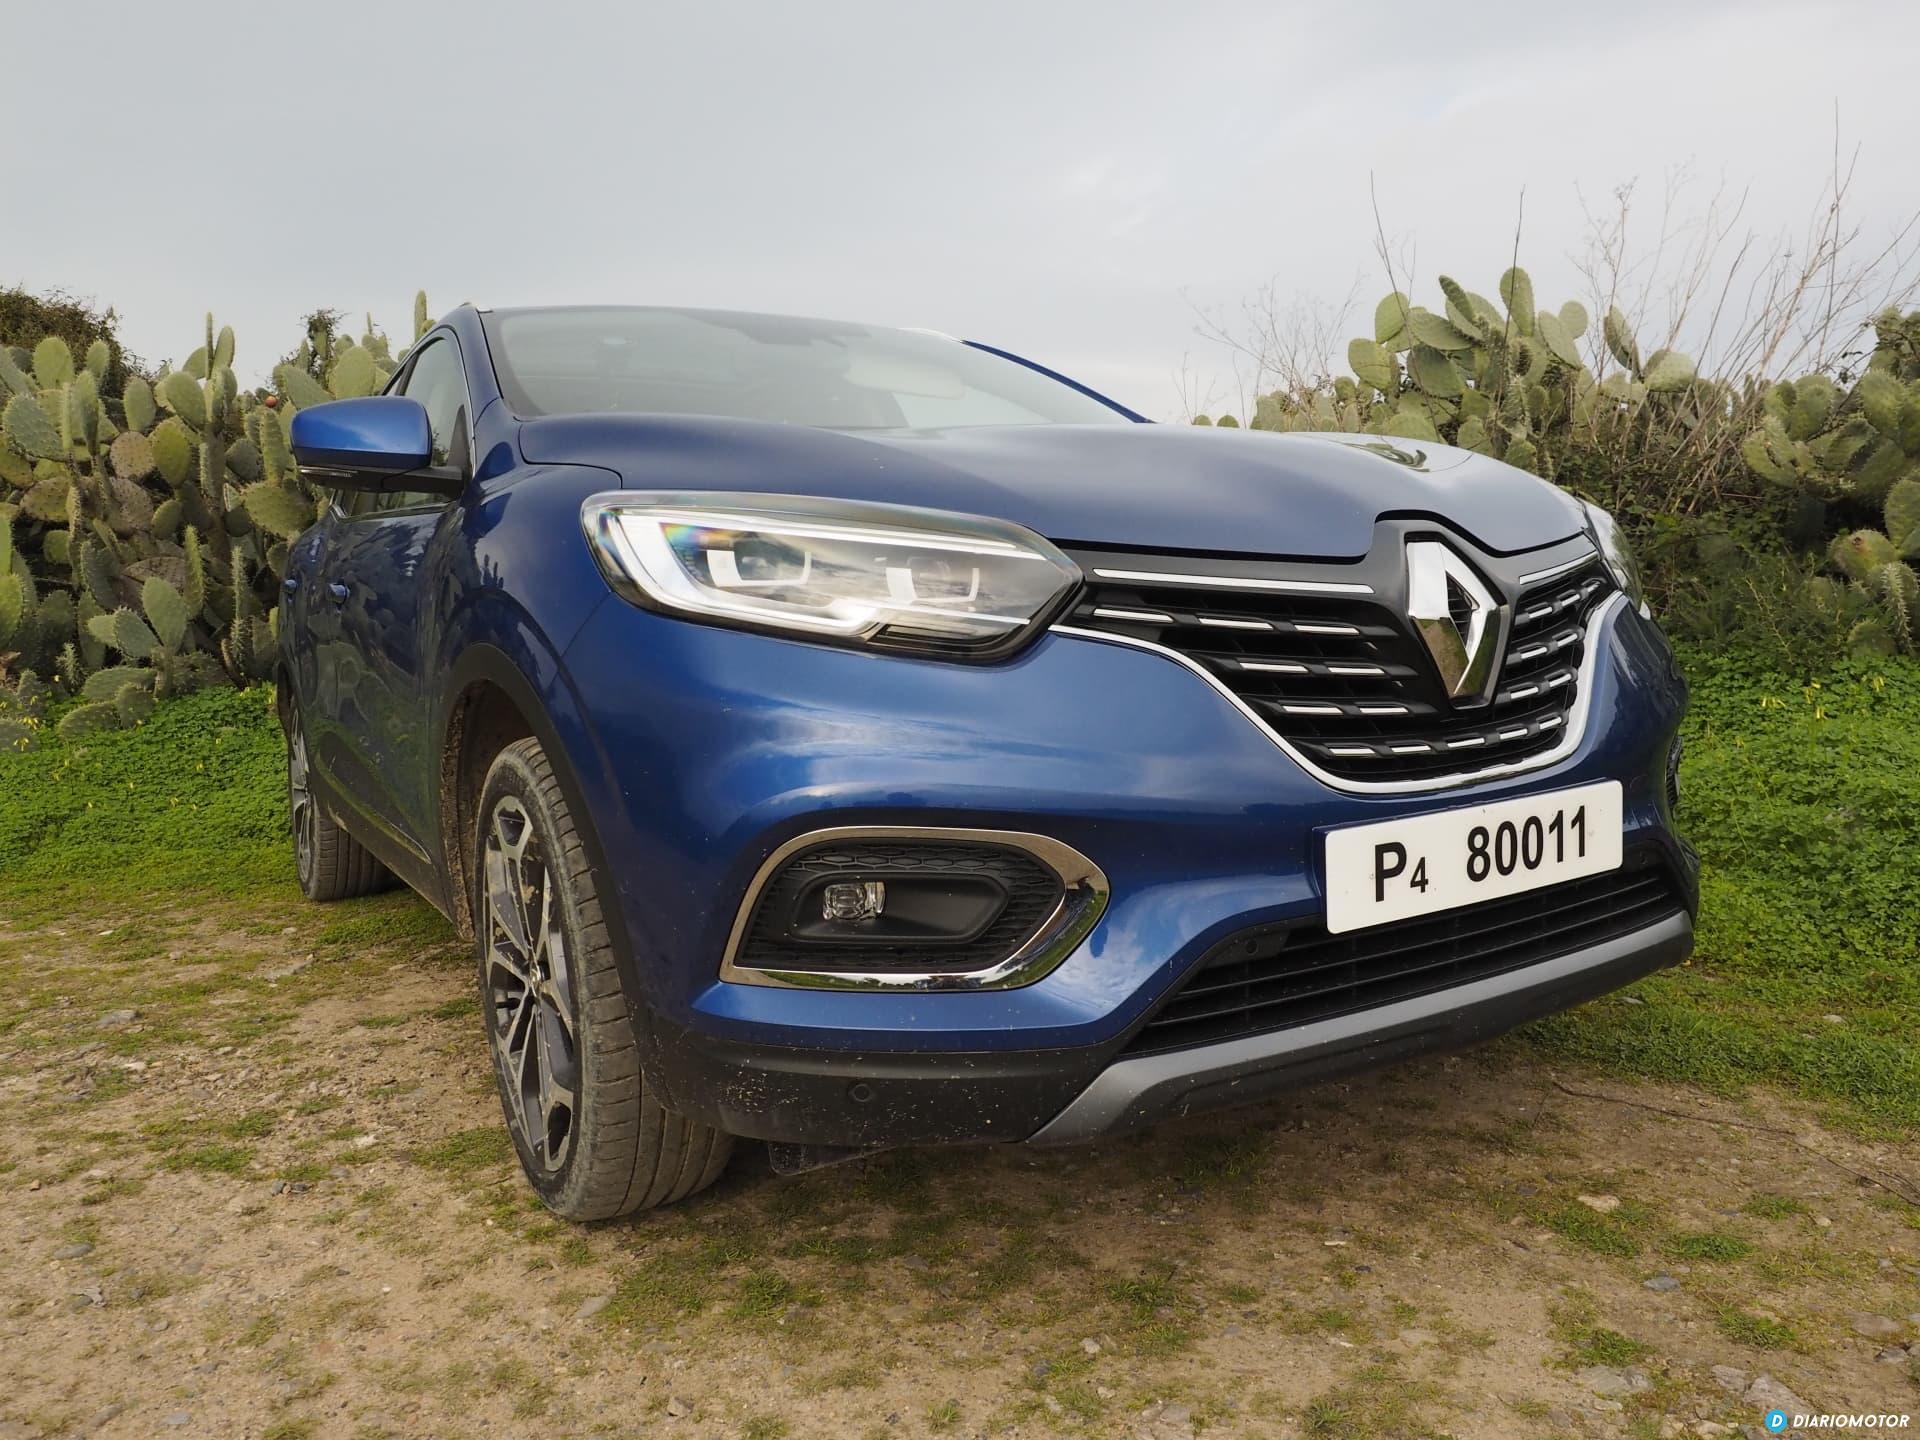 Renault Kadjar 2019 Exterior 00007